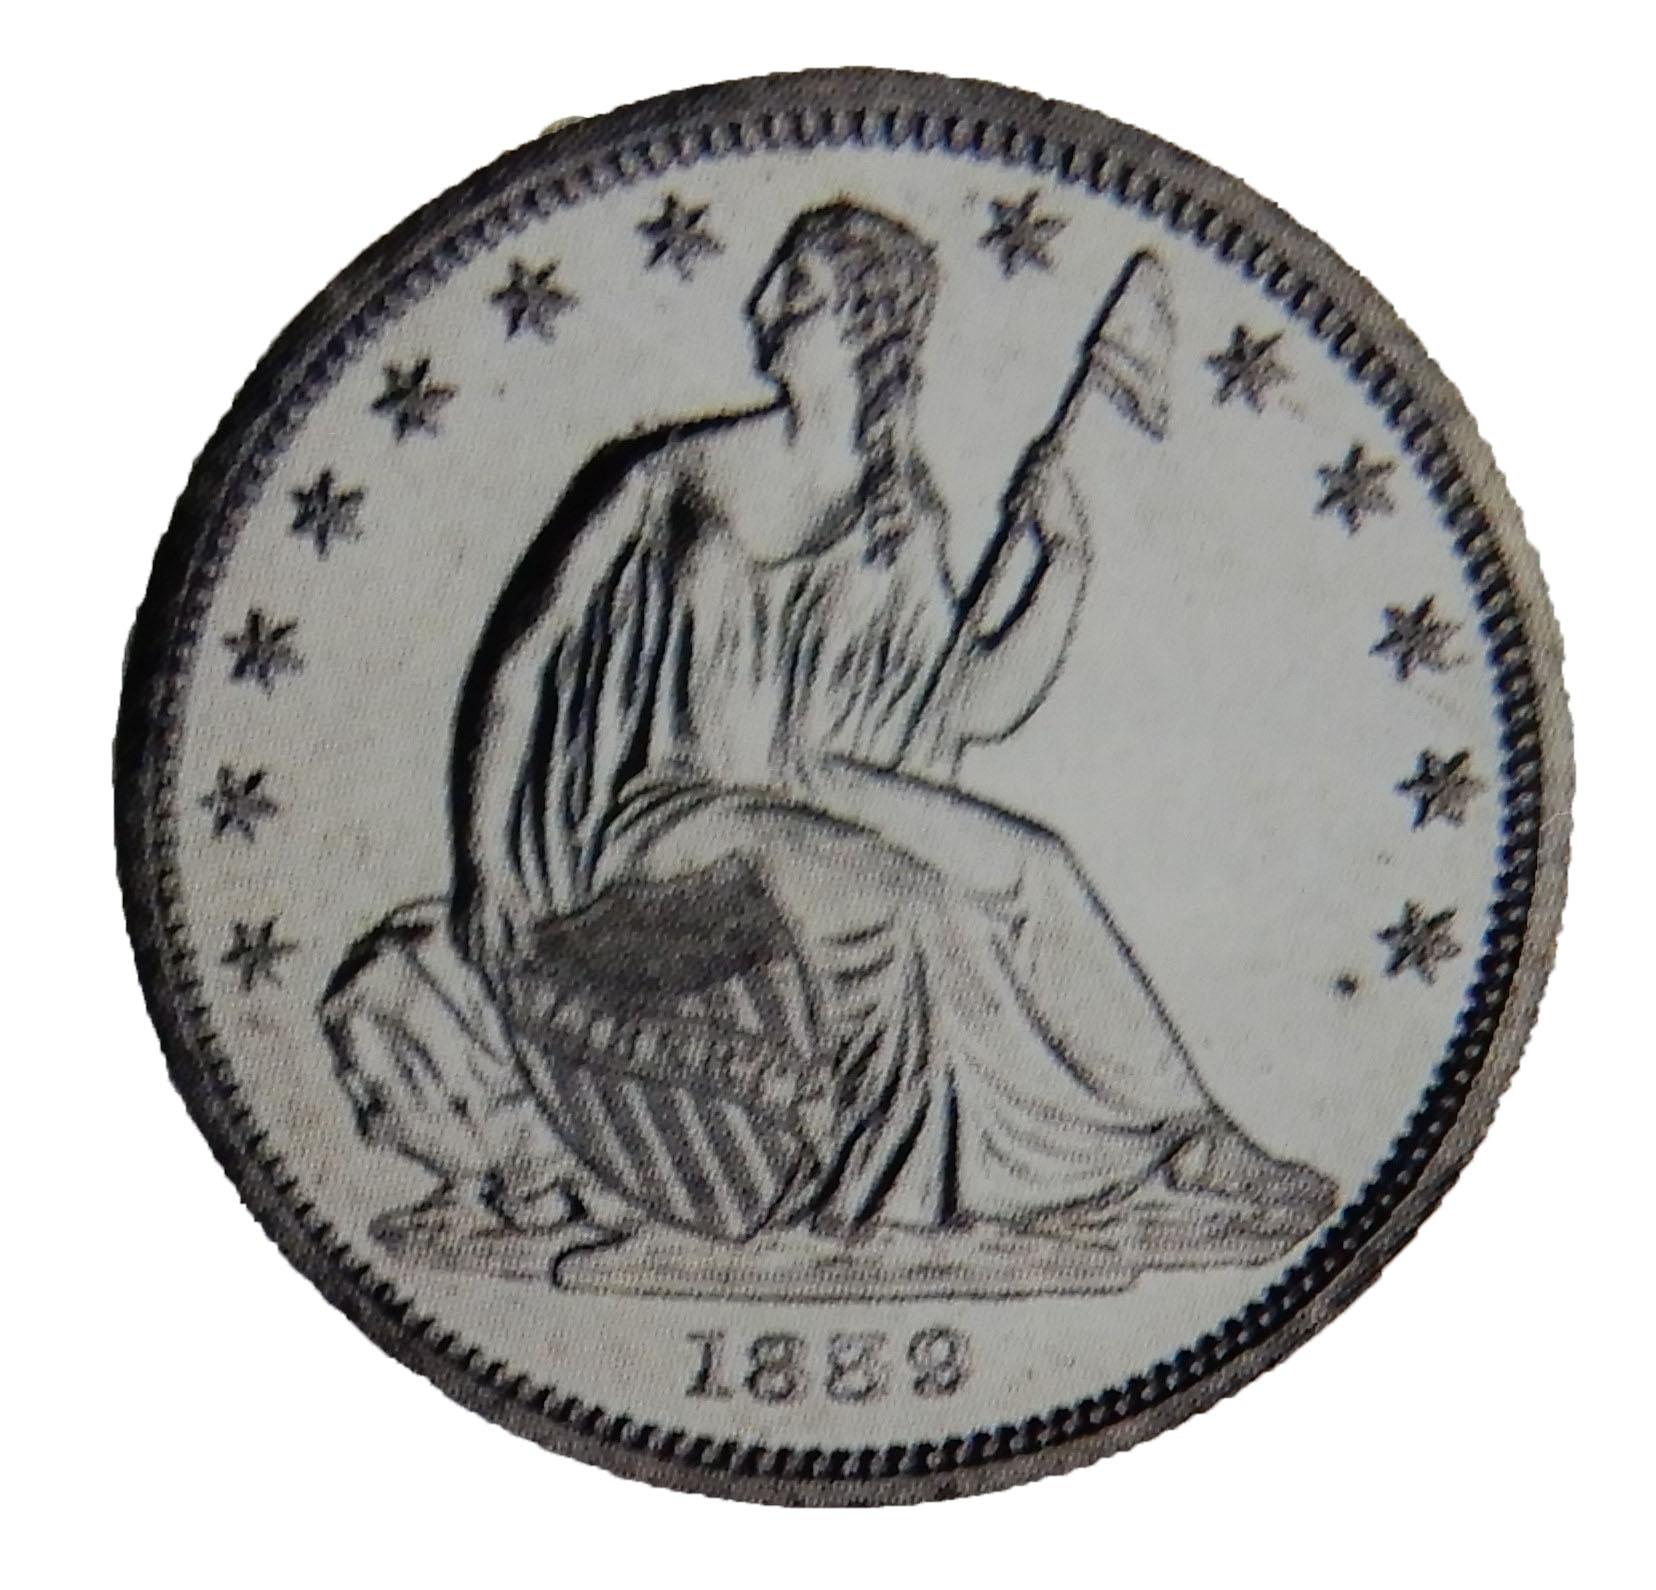 Seated Liberty Half Dollar (1839 - 1891)